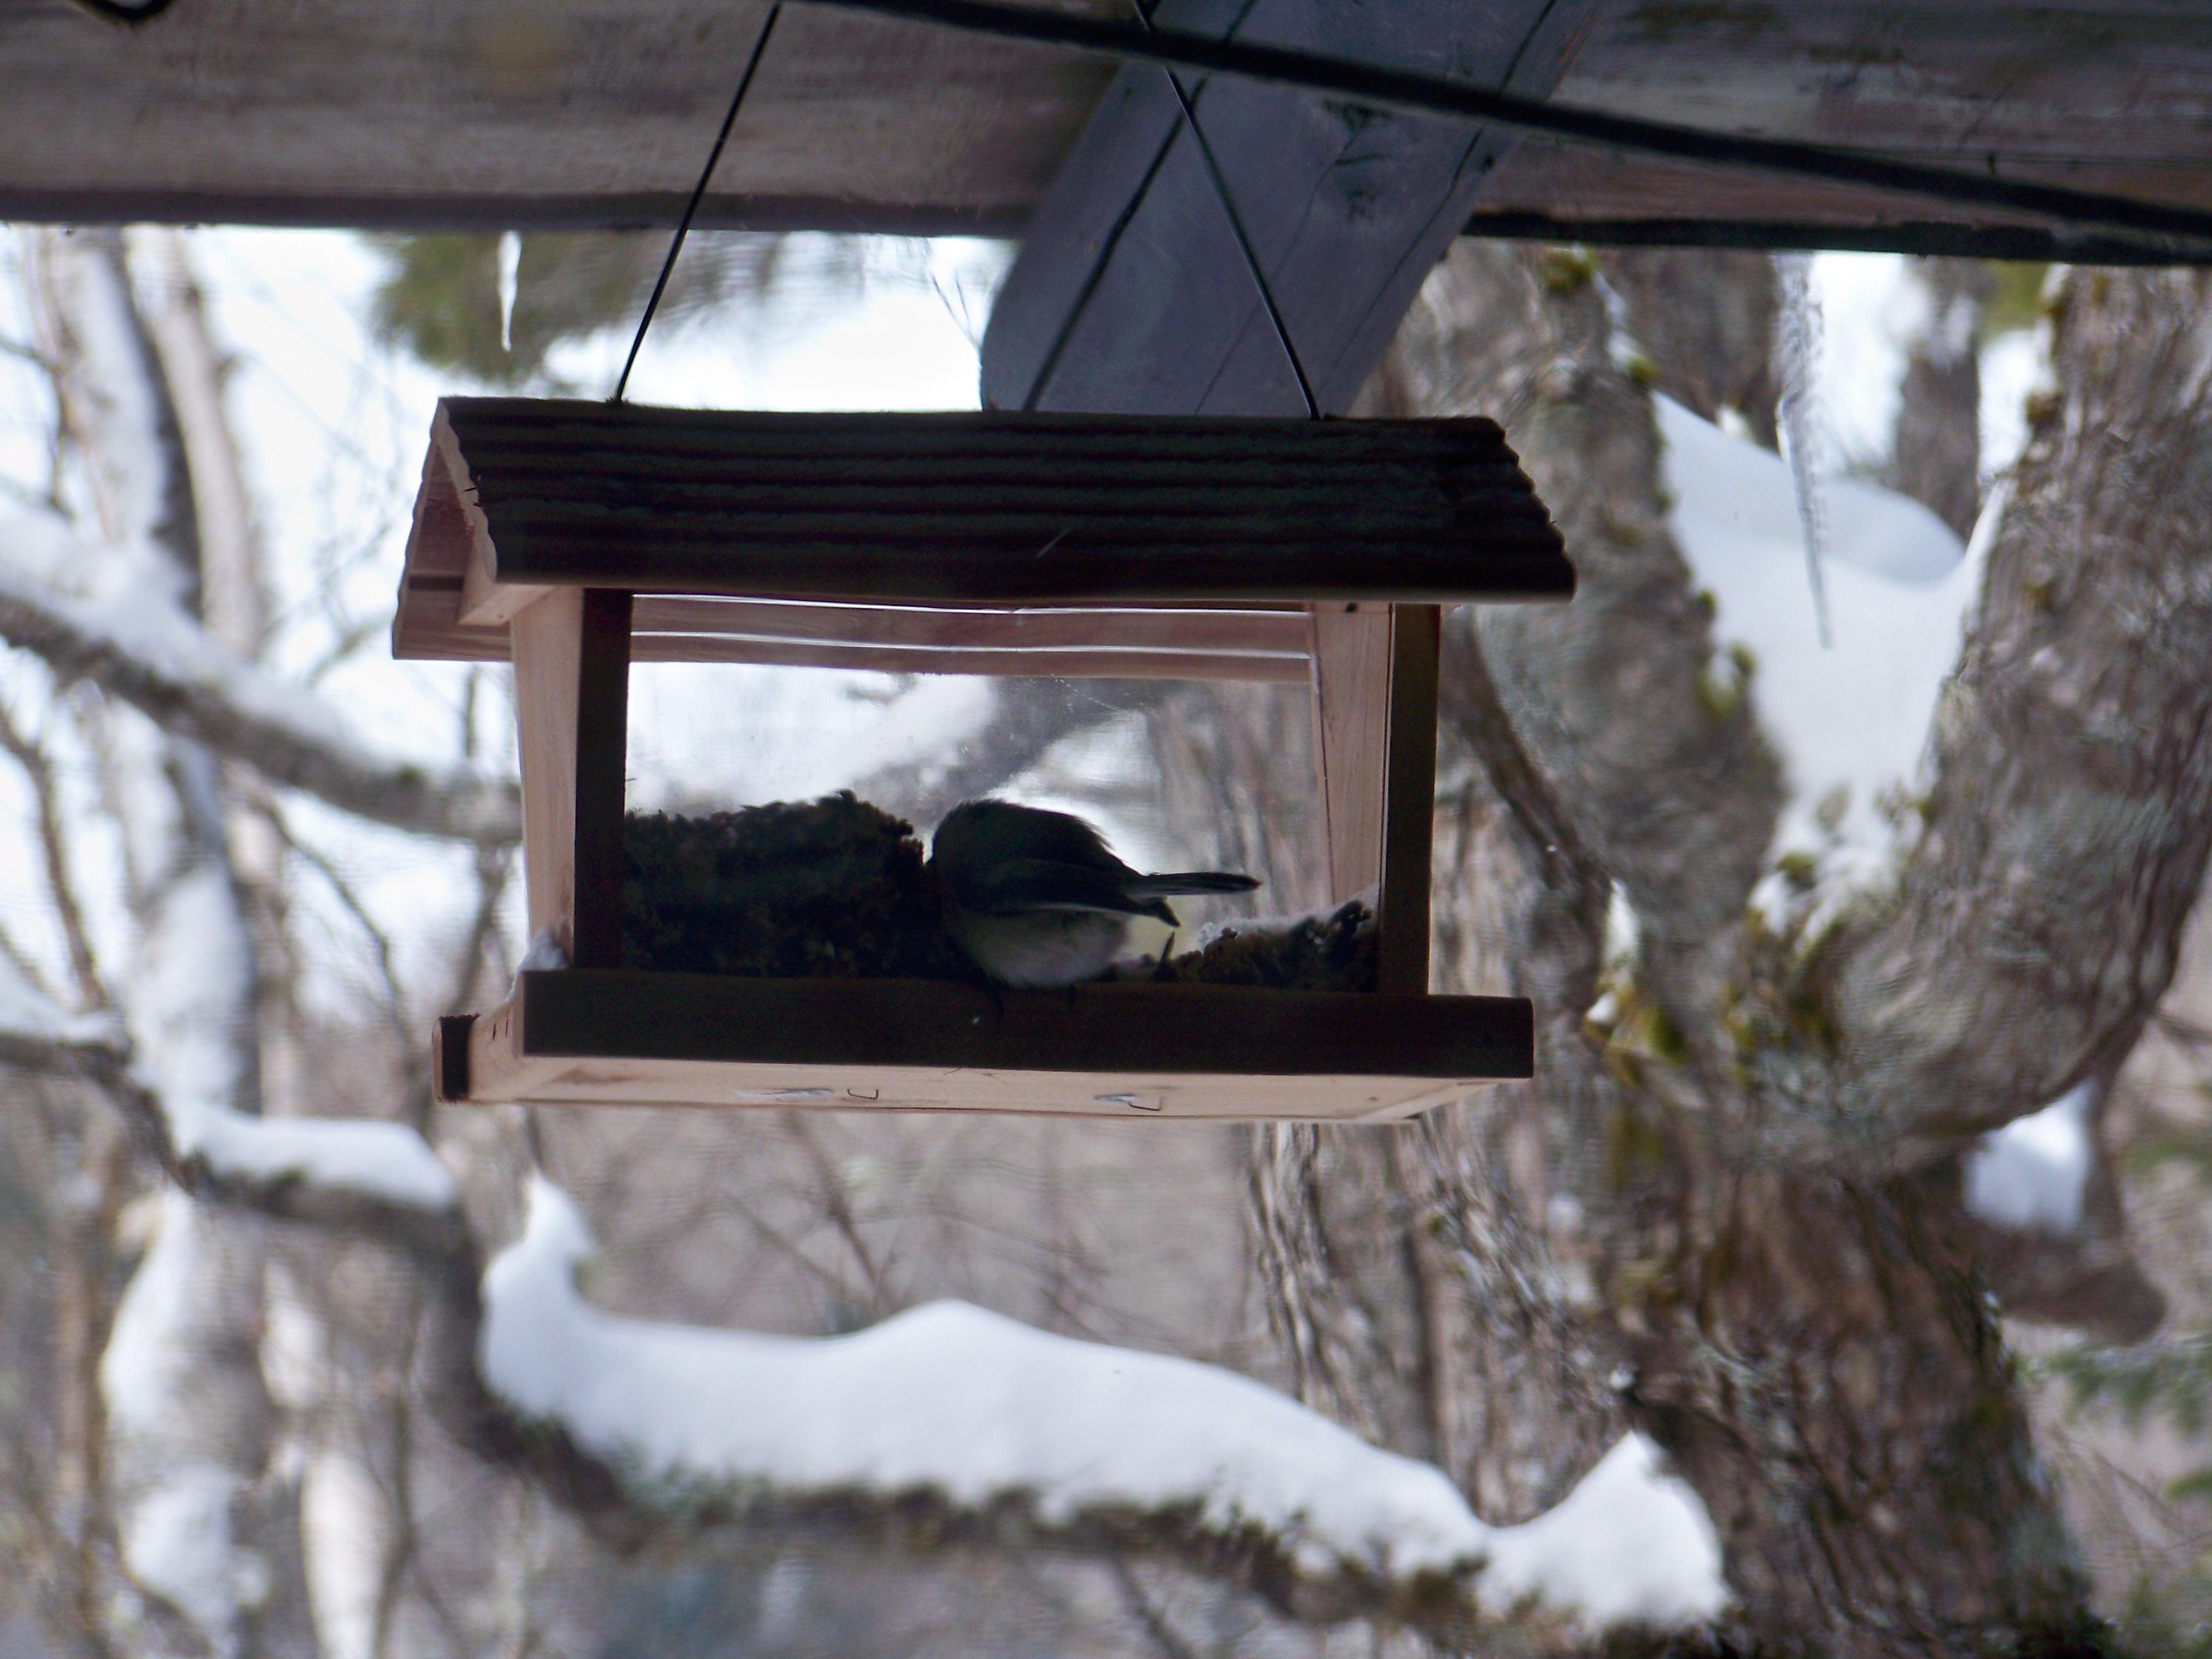 February chickadee in the feeder